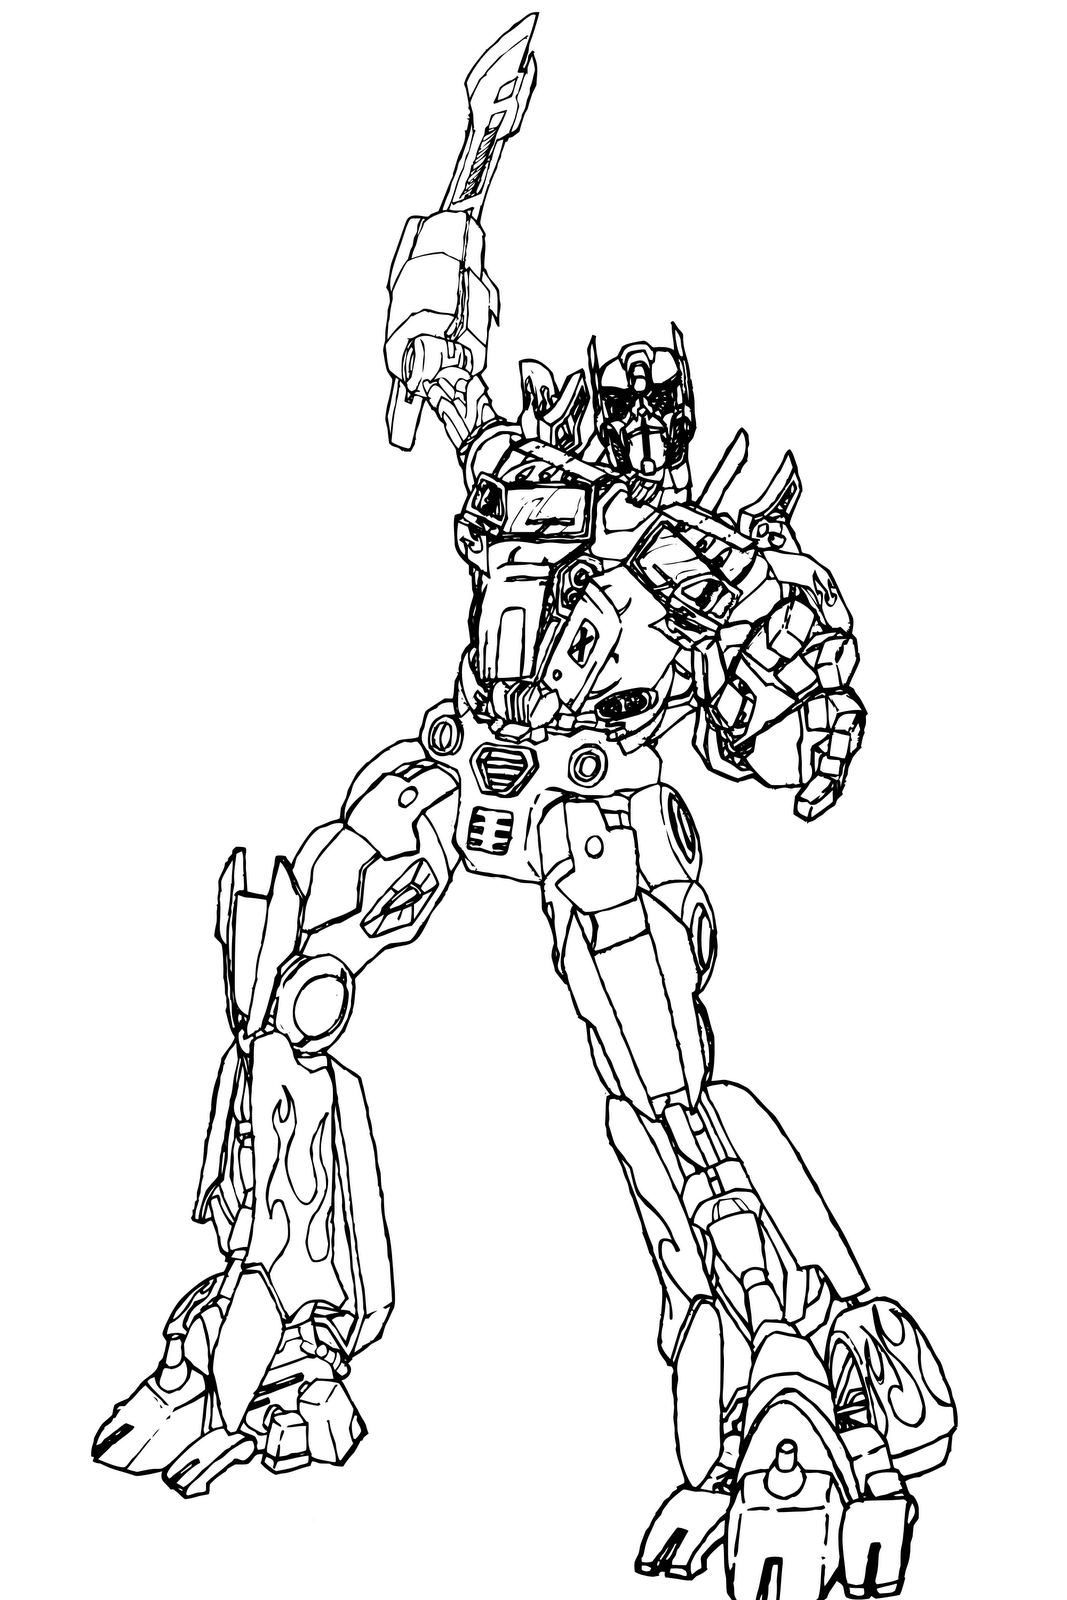 transformers boyama sayfası indir  ilosofia